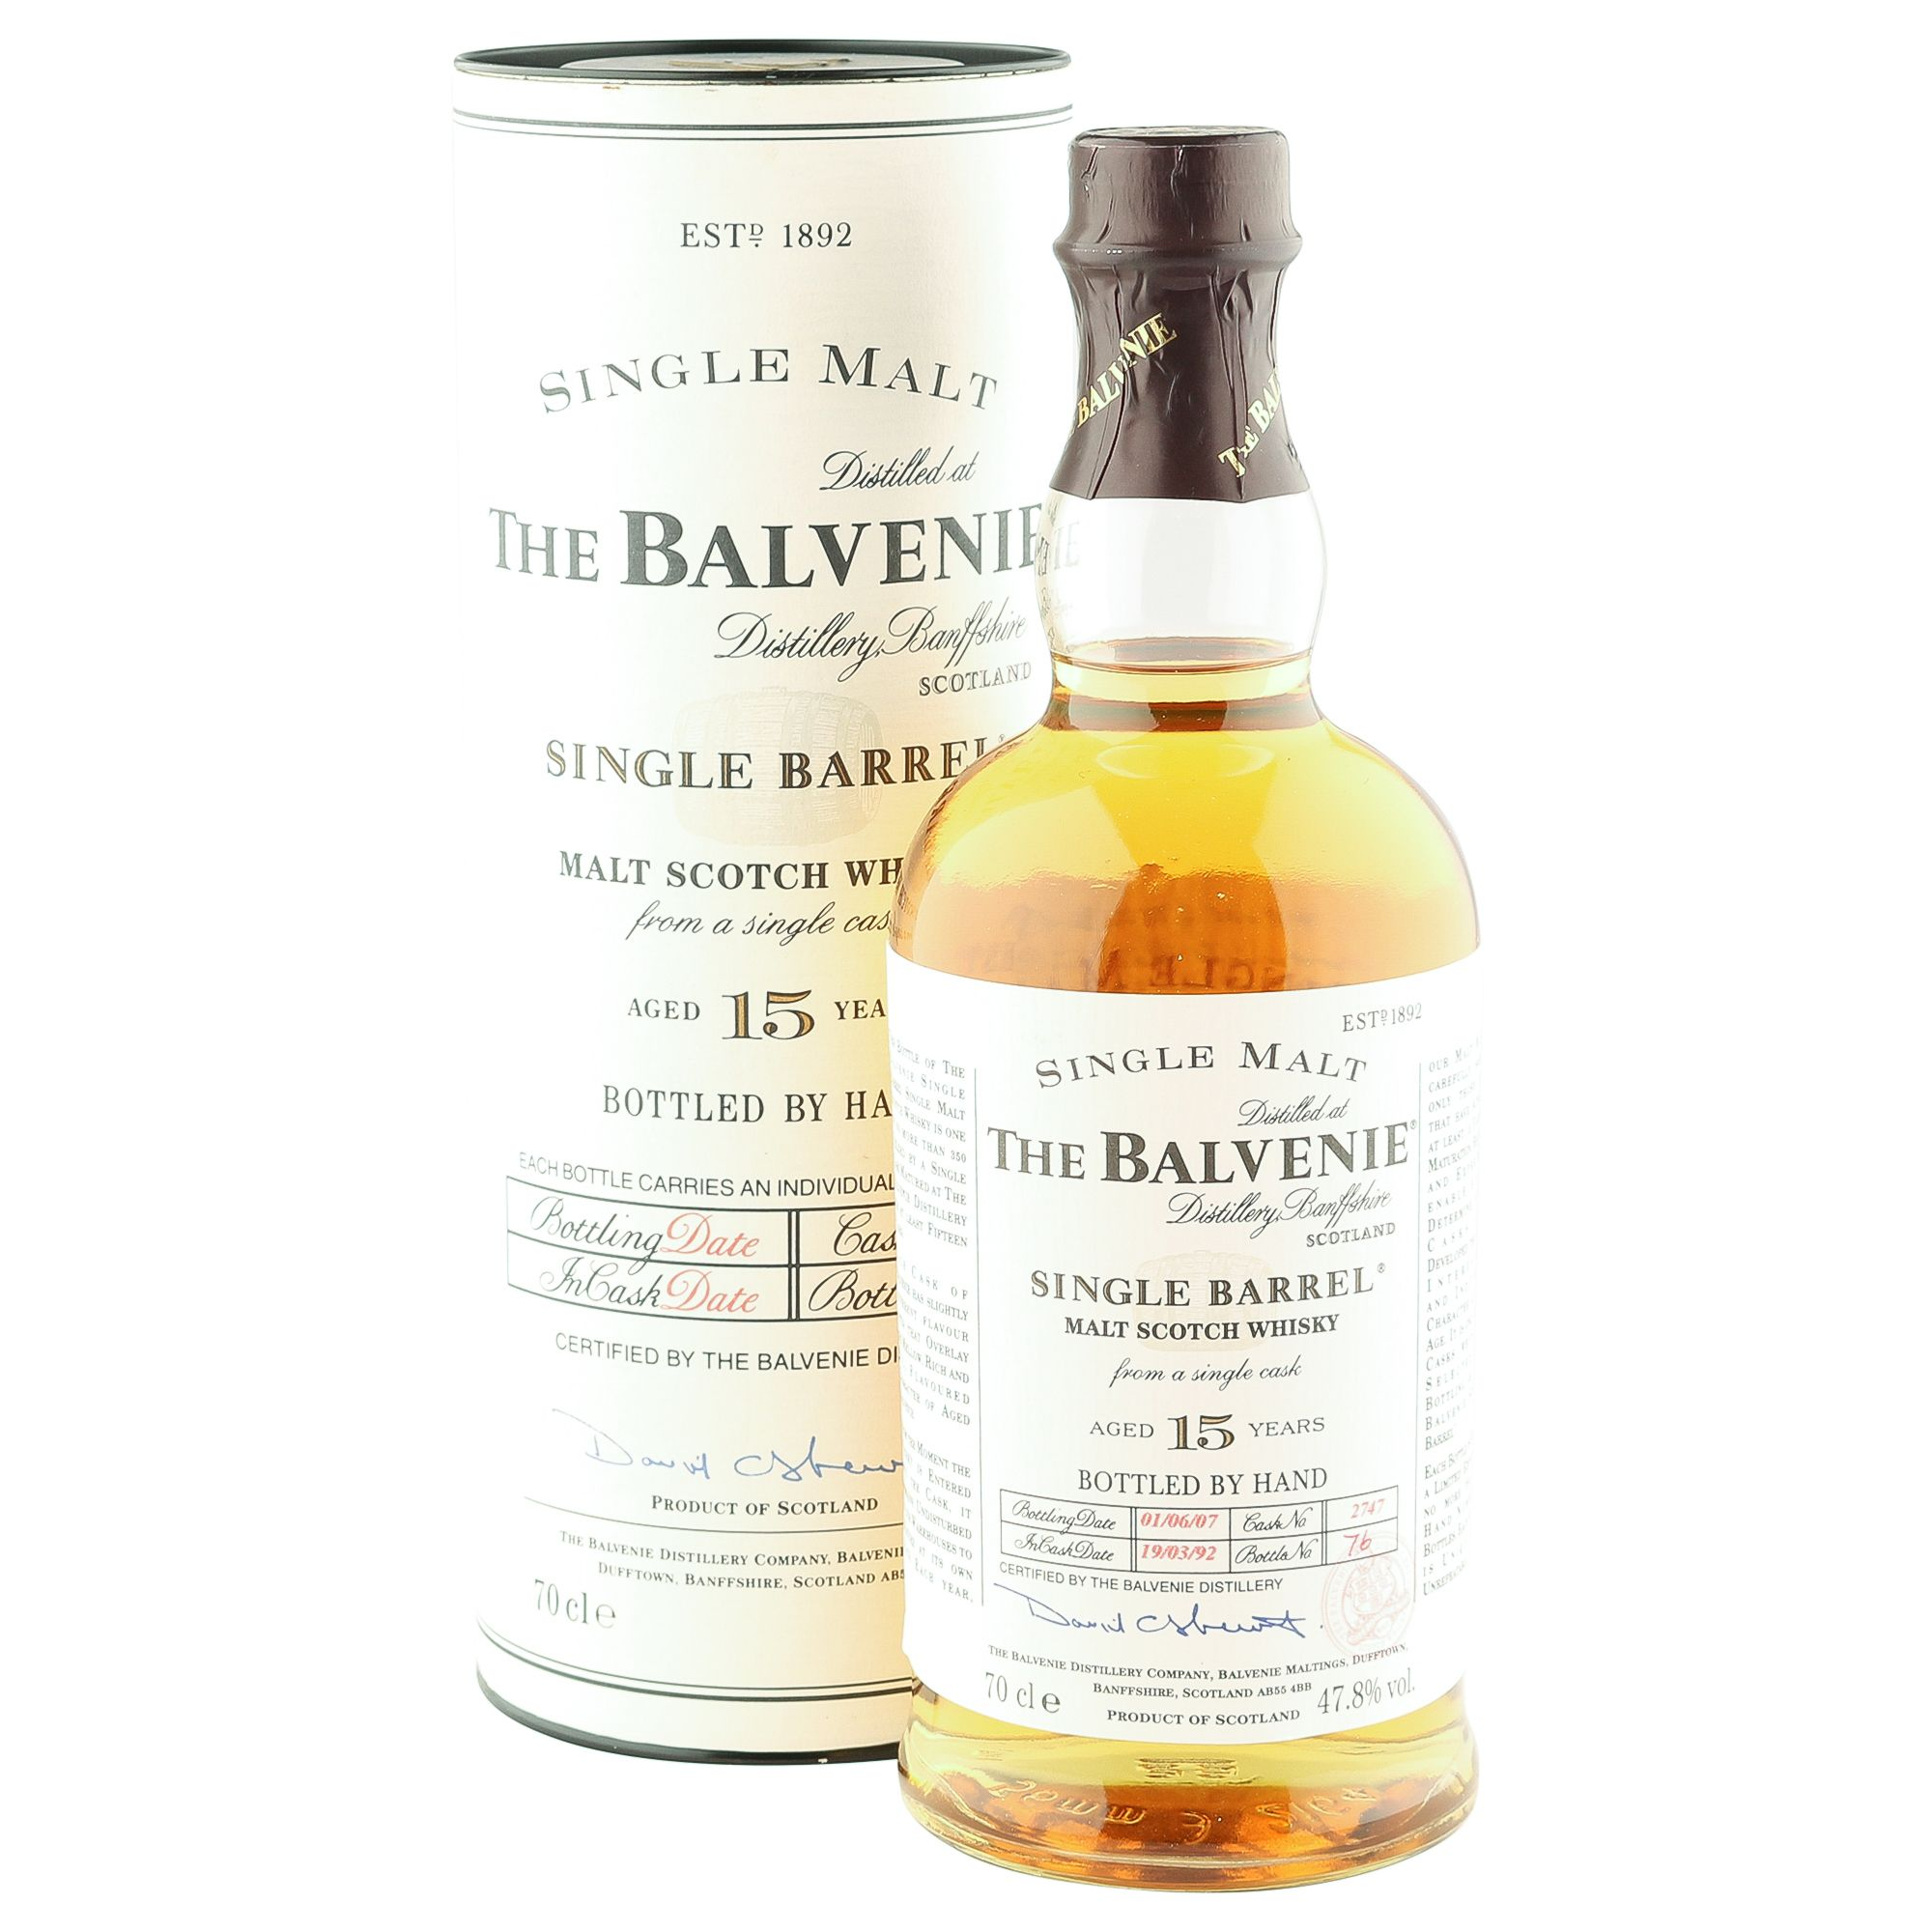 Balvenie Single Barrel 15 Year